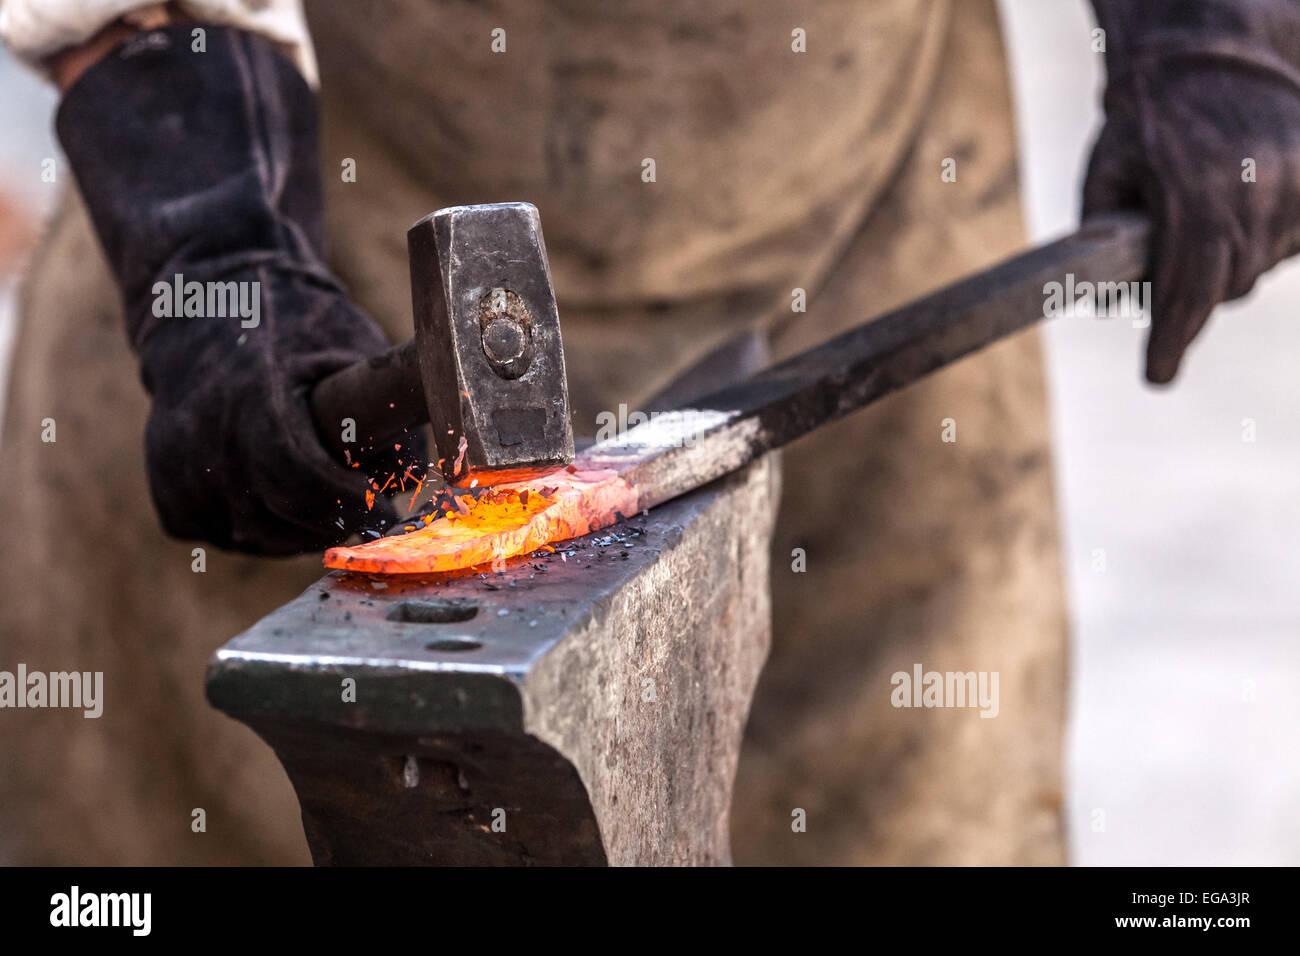 Blacksmith anvil and hammer at work - Stock Image